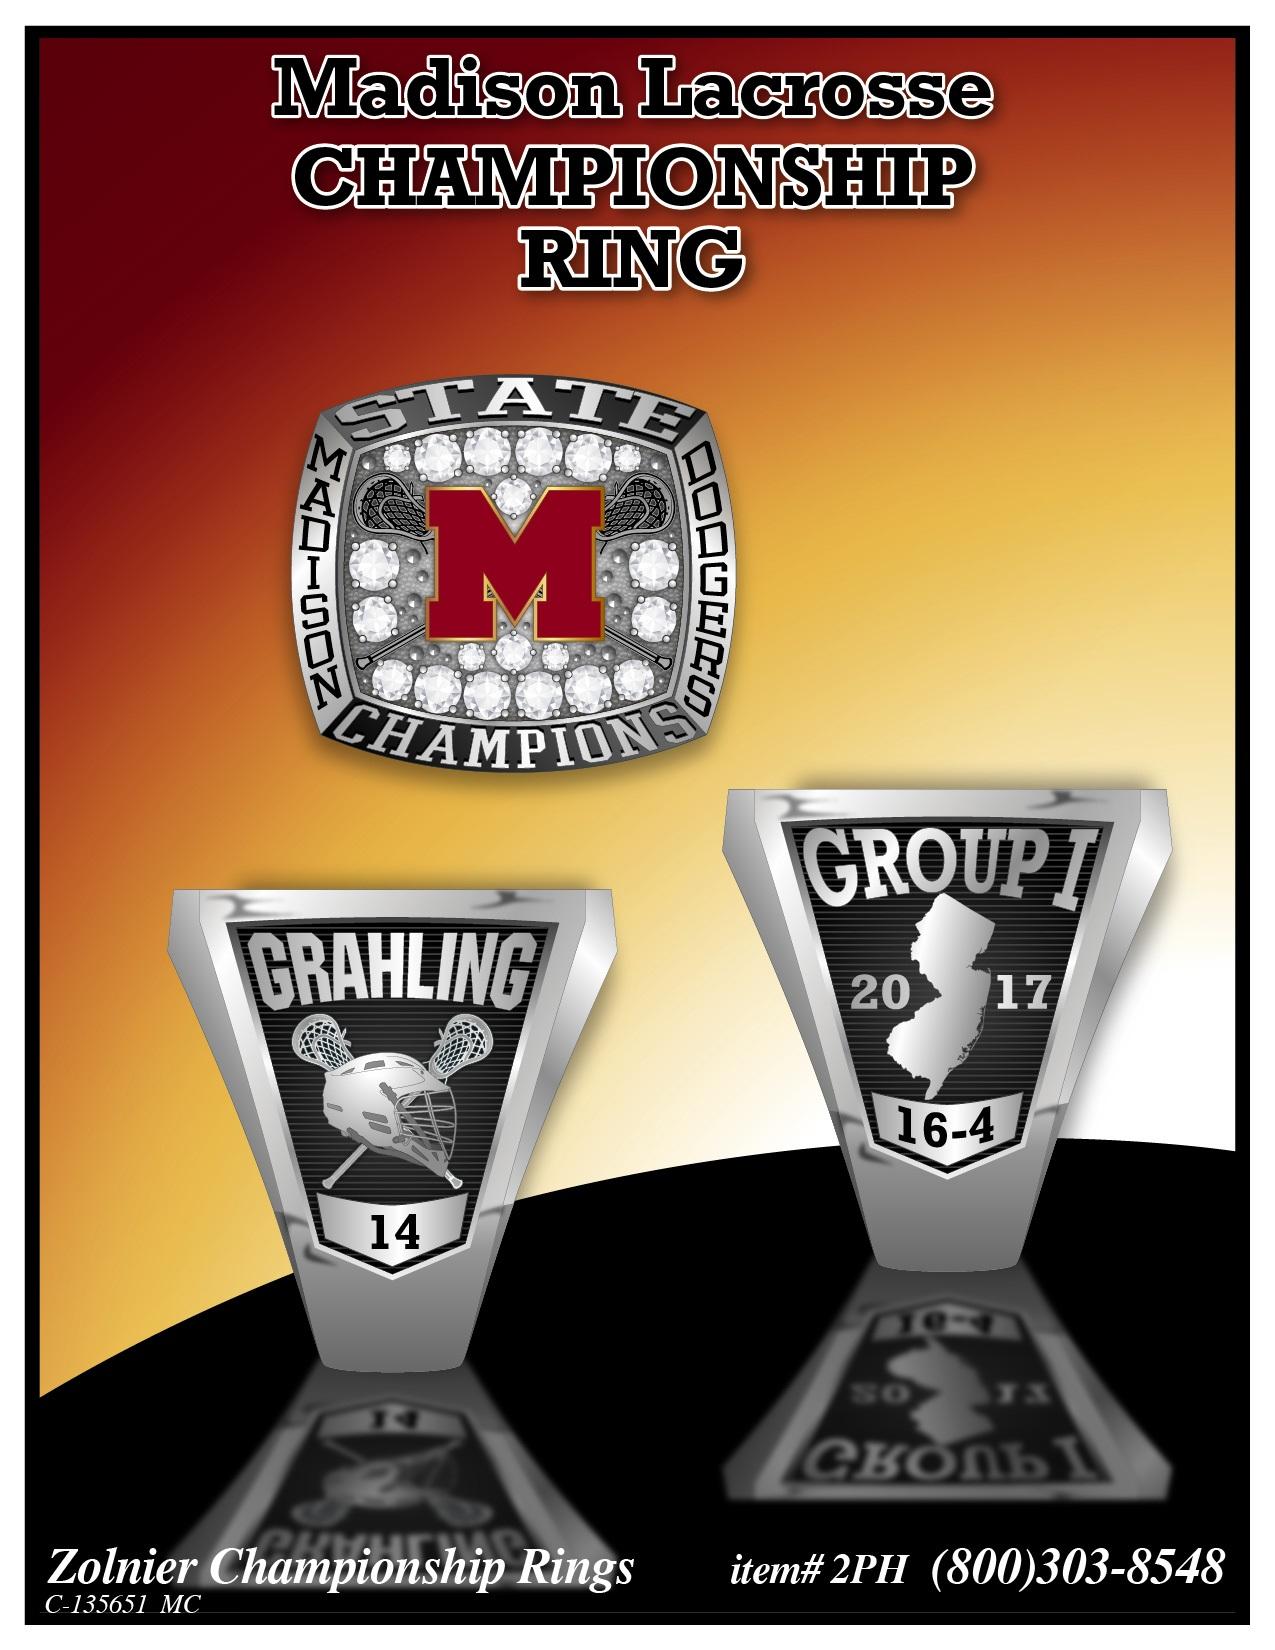 C-135651 Madison Lacrosse Champ Ring MC